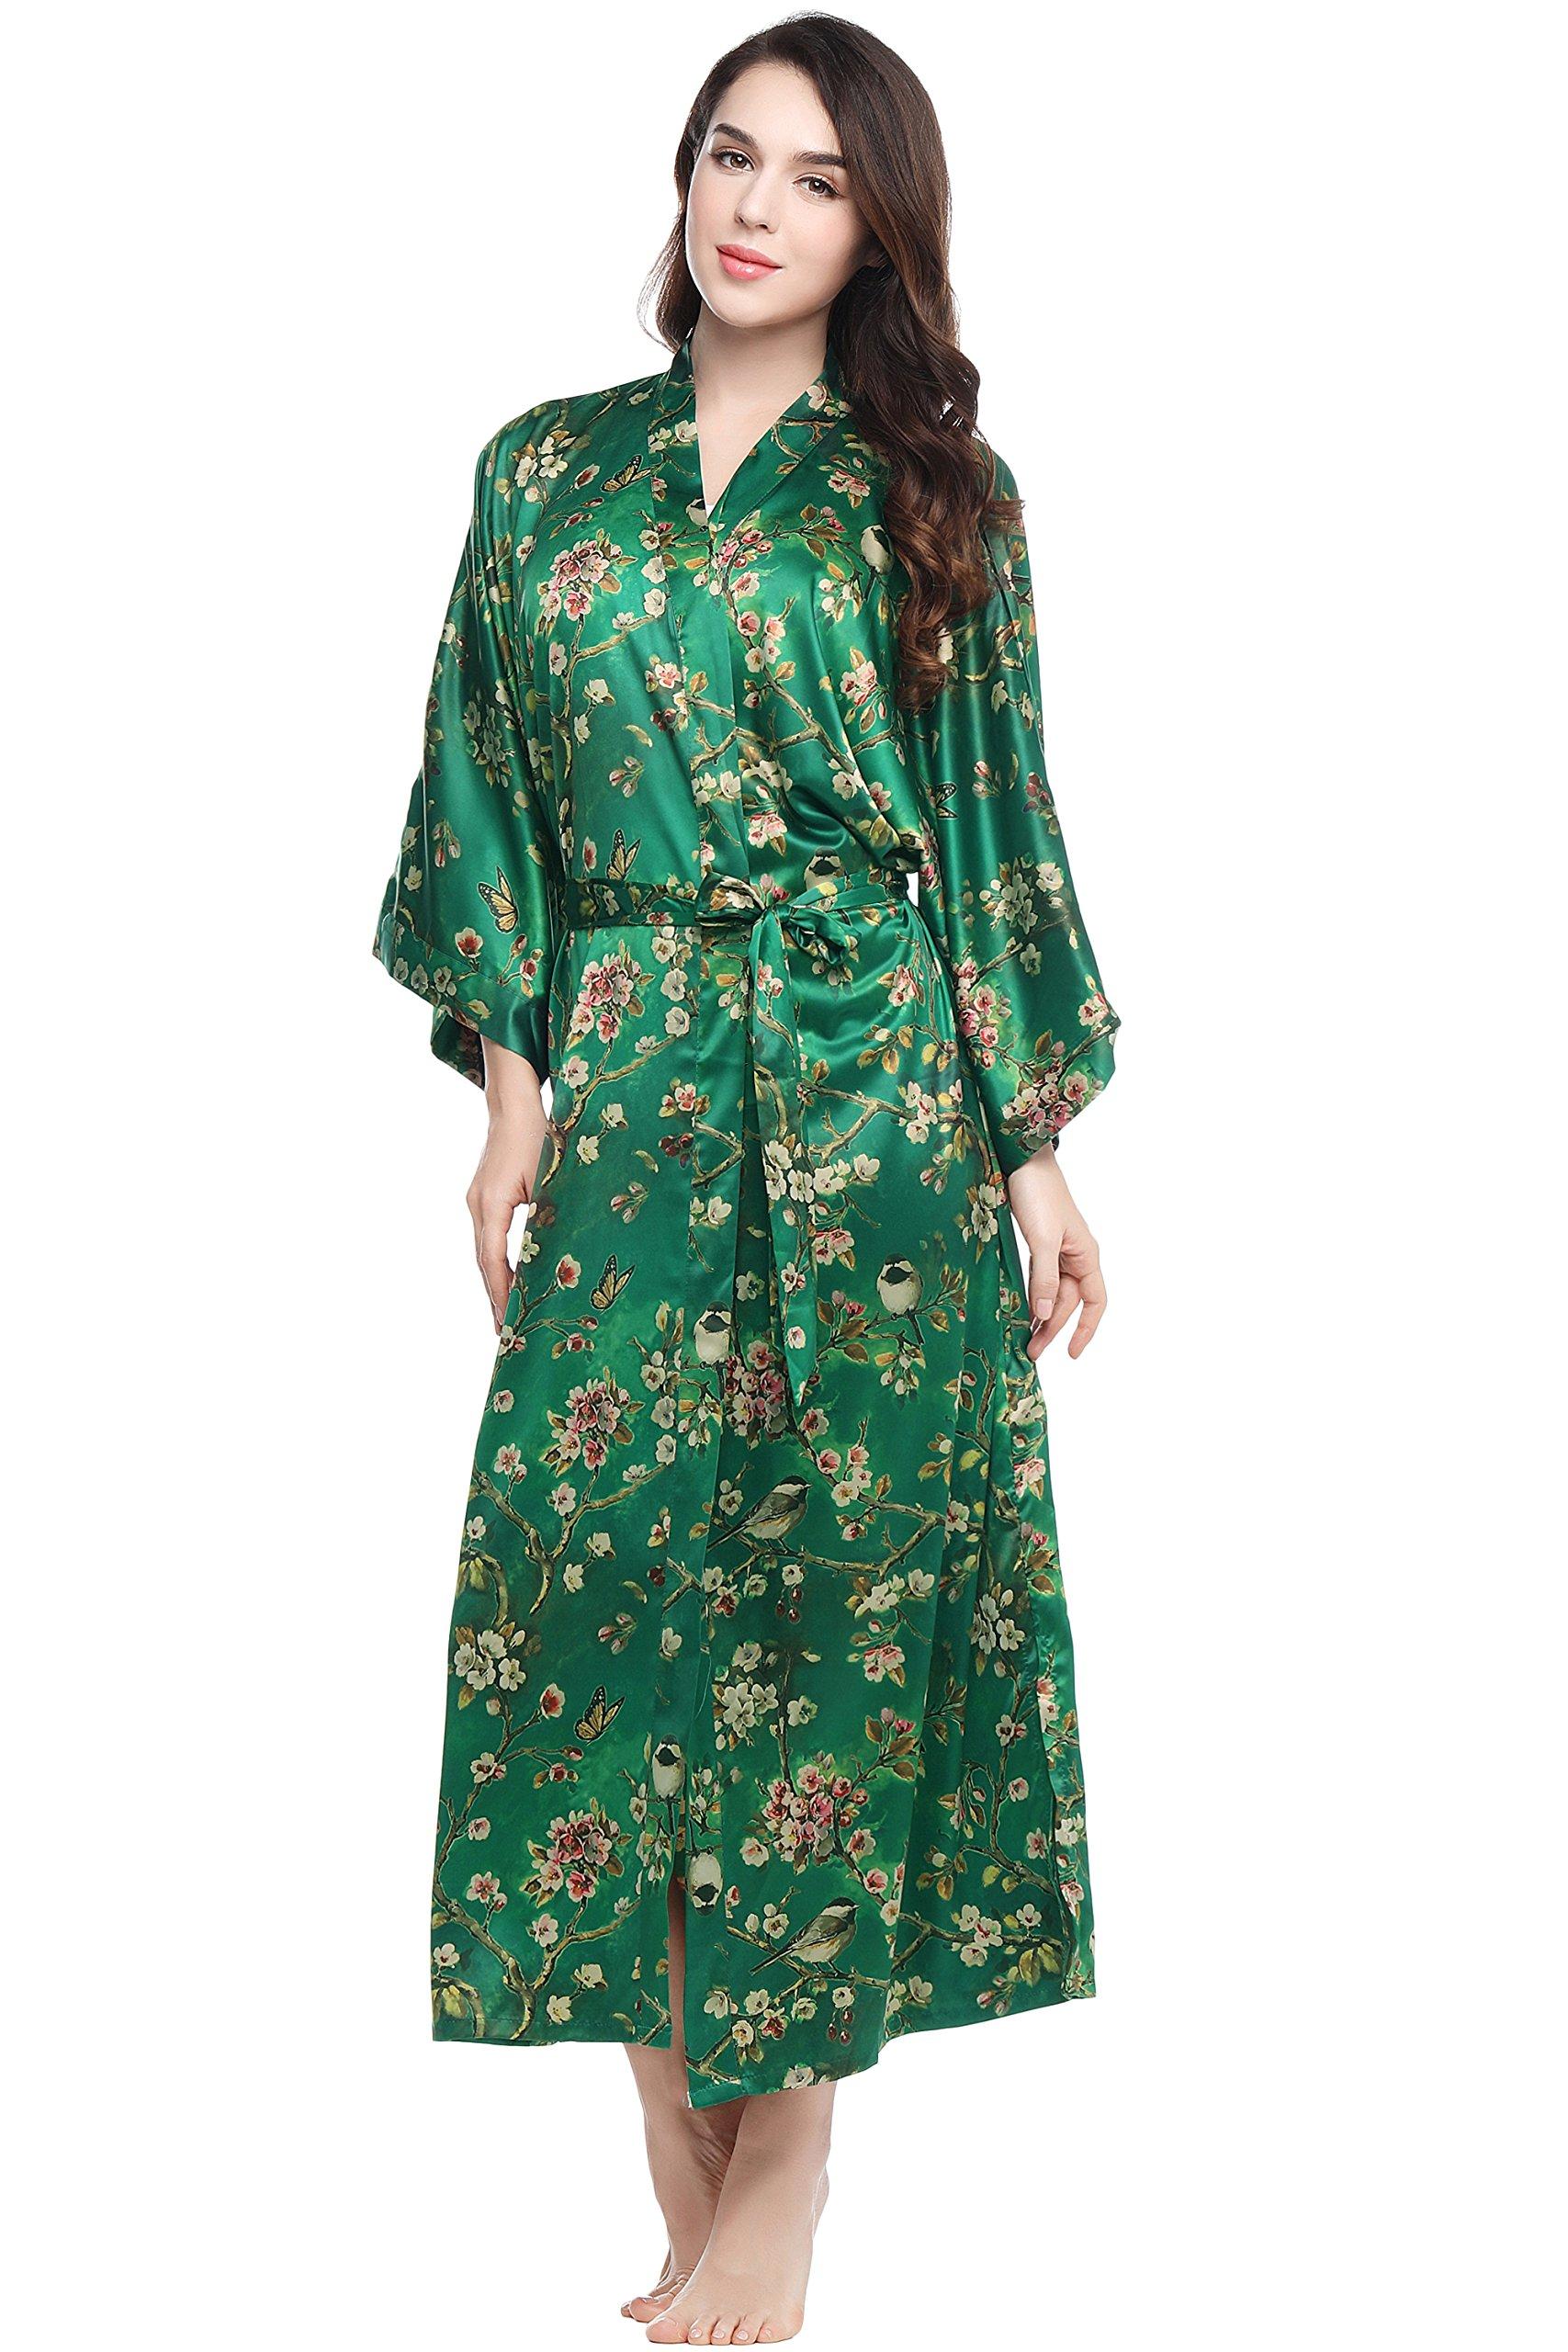 BABEYOND Floral Kimono Robe Satin Silk Wedding Robe Nightgown Sleepwear 53'' Long (Plum Blossom-Green)